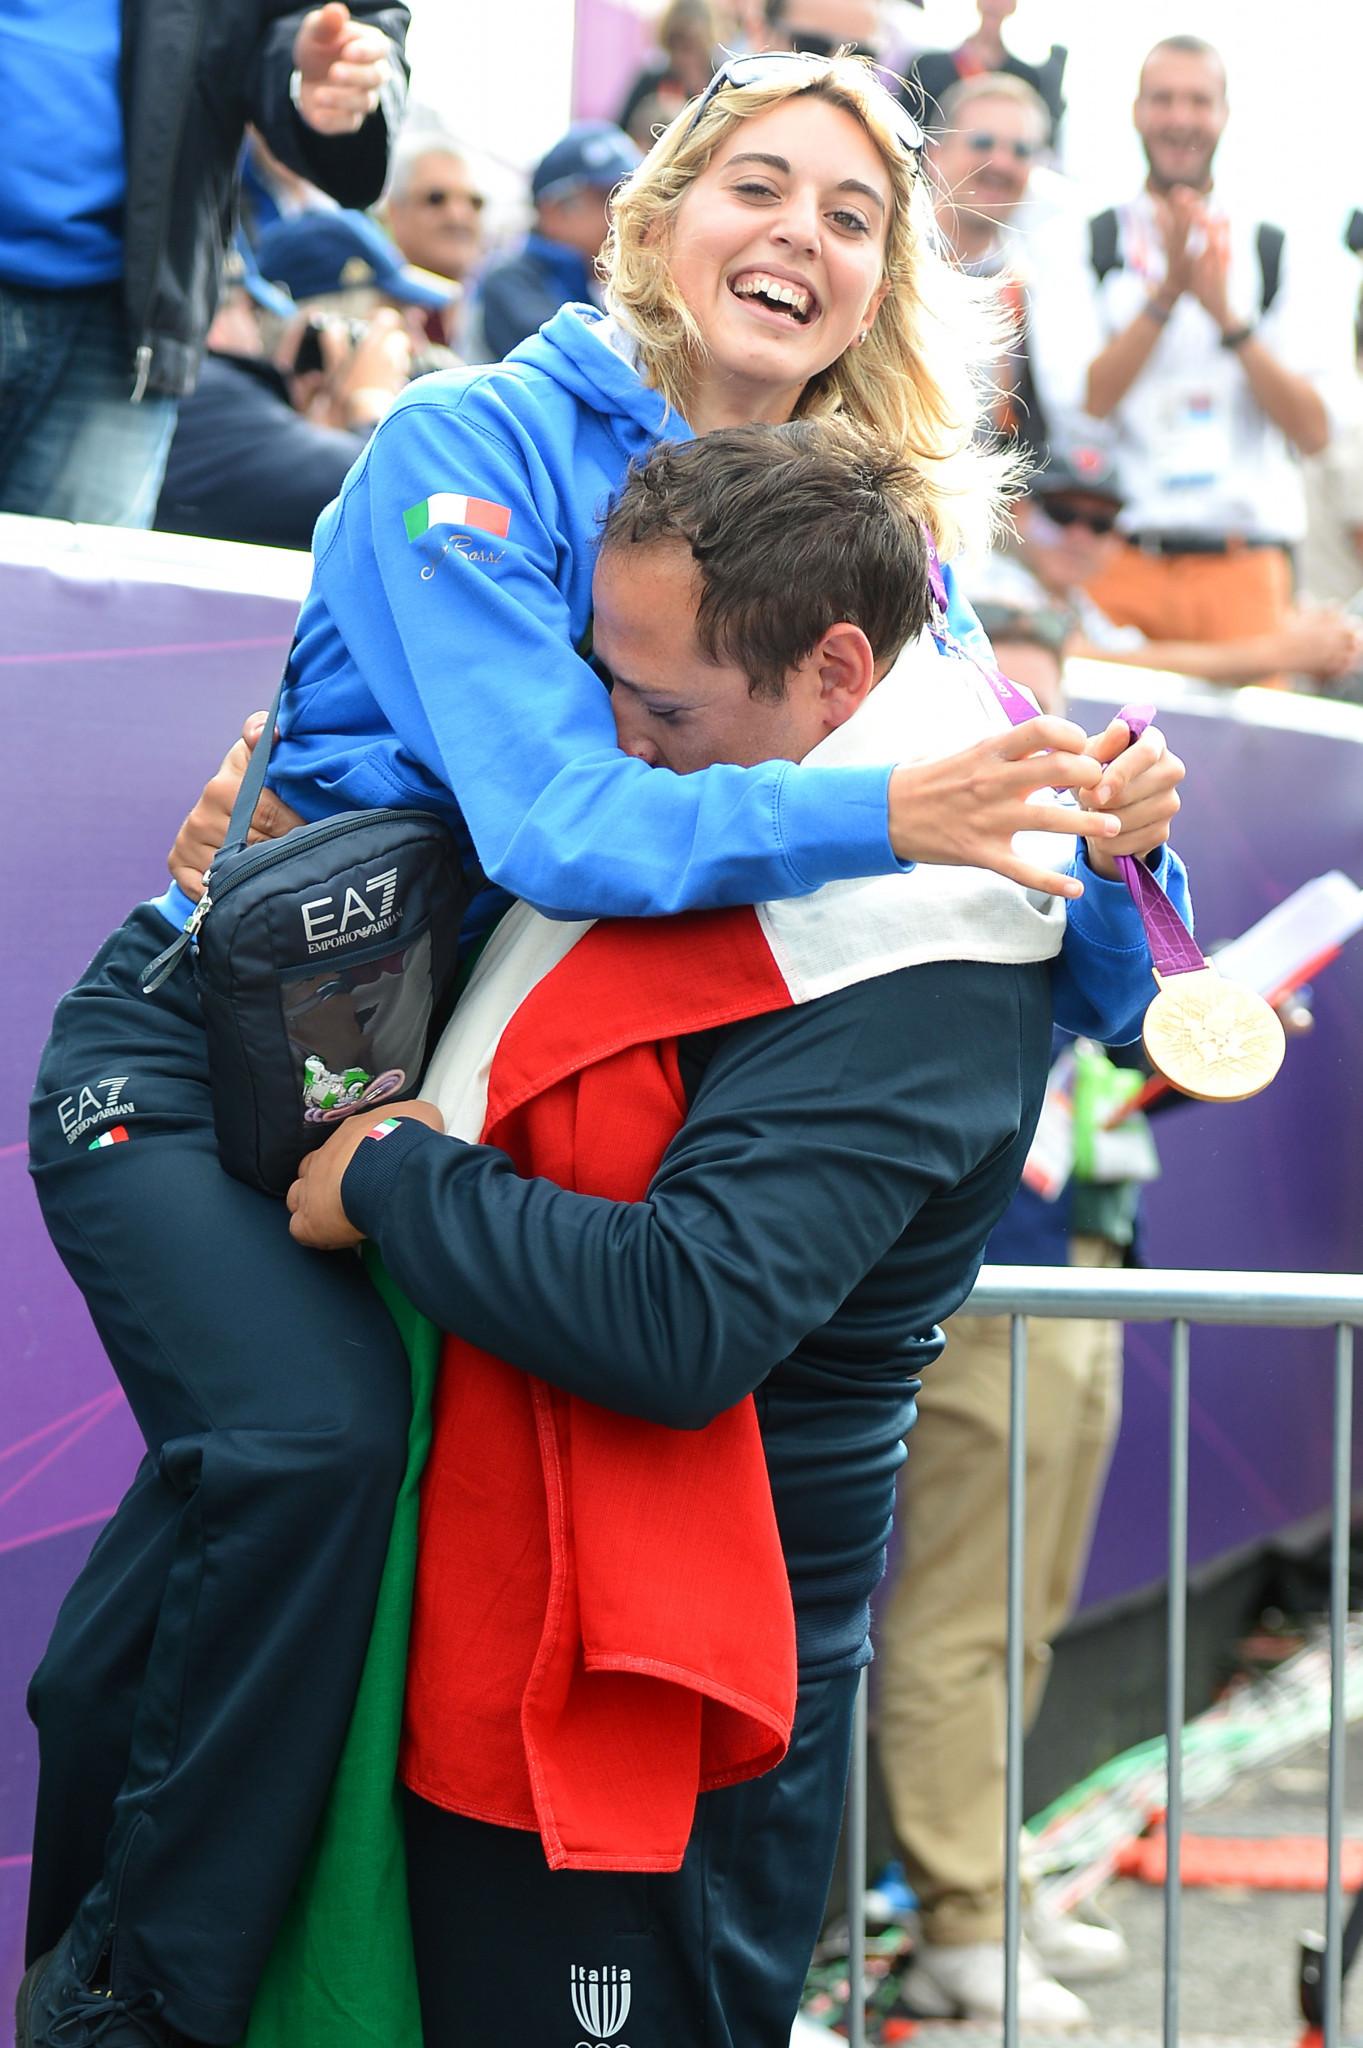 London 2012 Olympic champion Jessica Rossi took the win as Satu Makela-Nummela faltered ©Getty Images